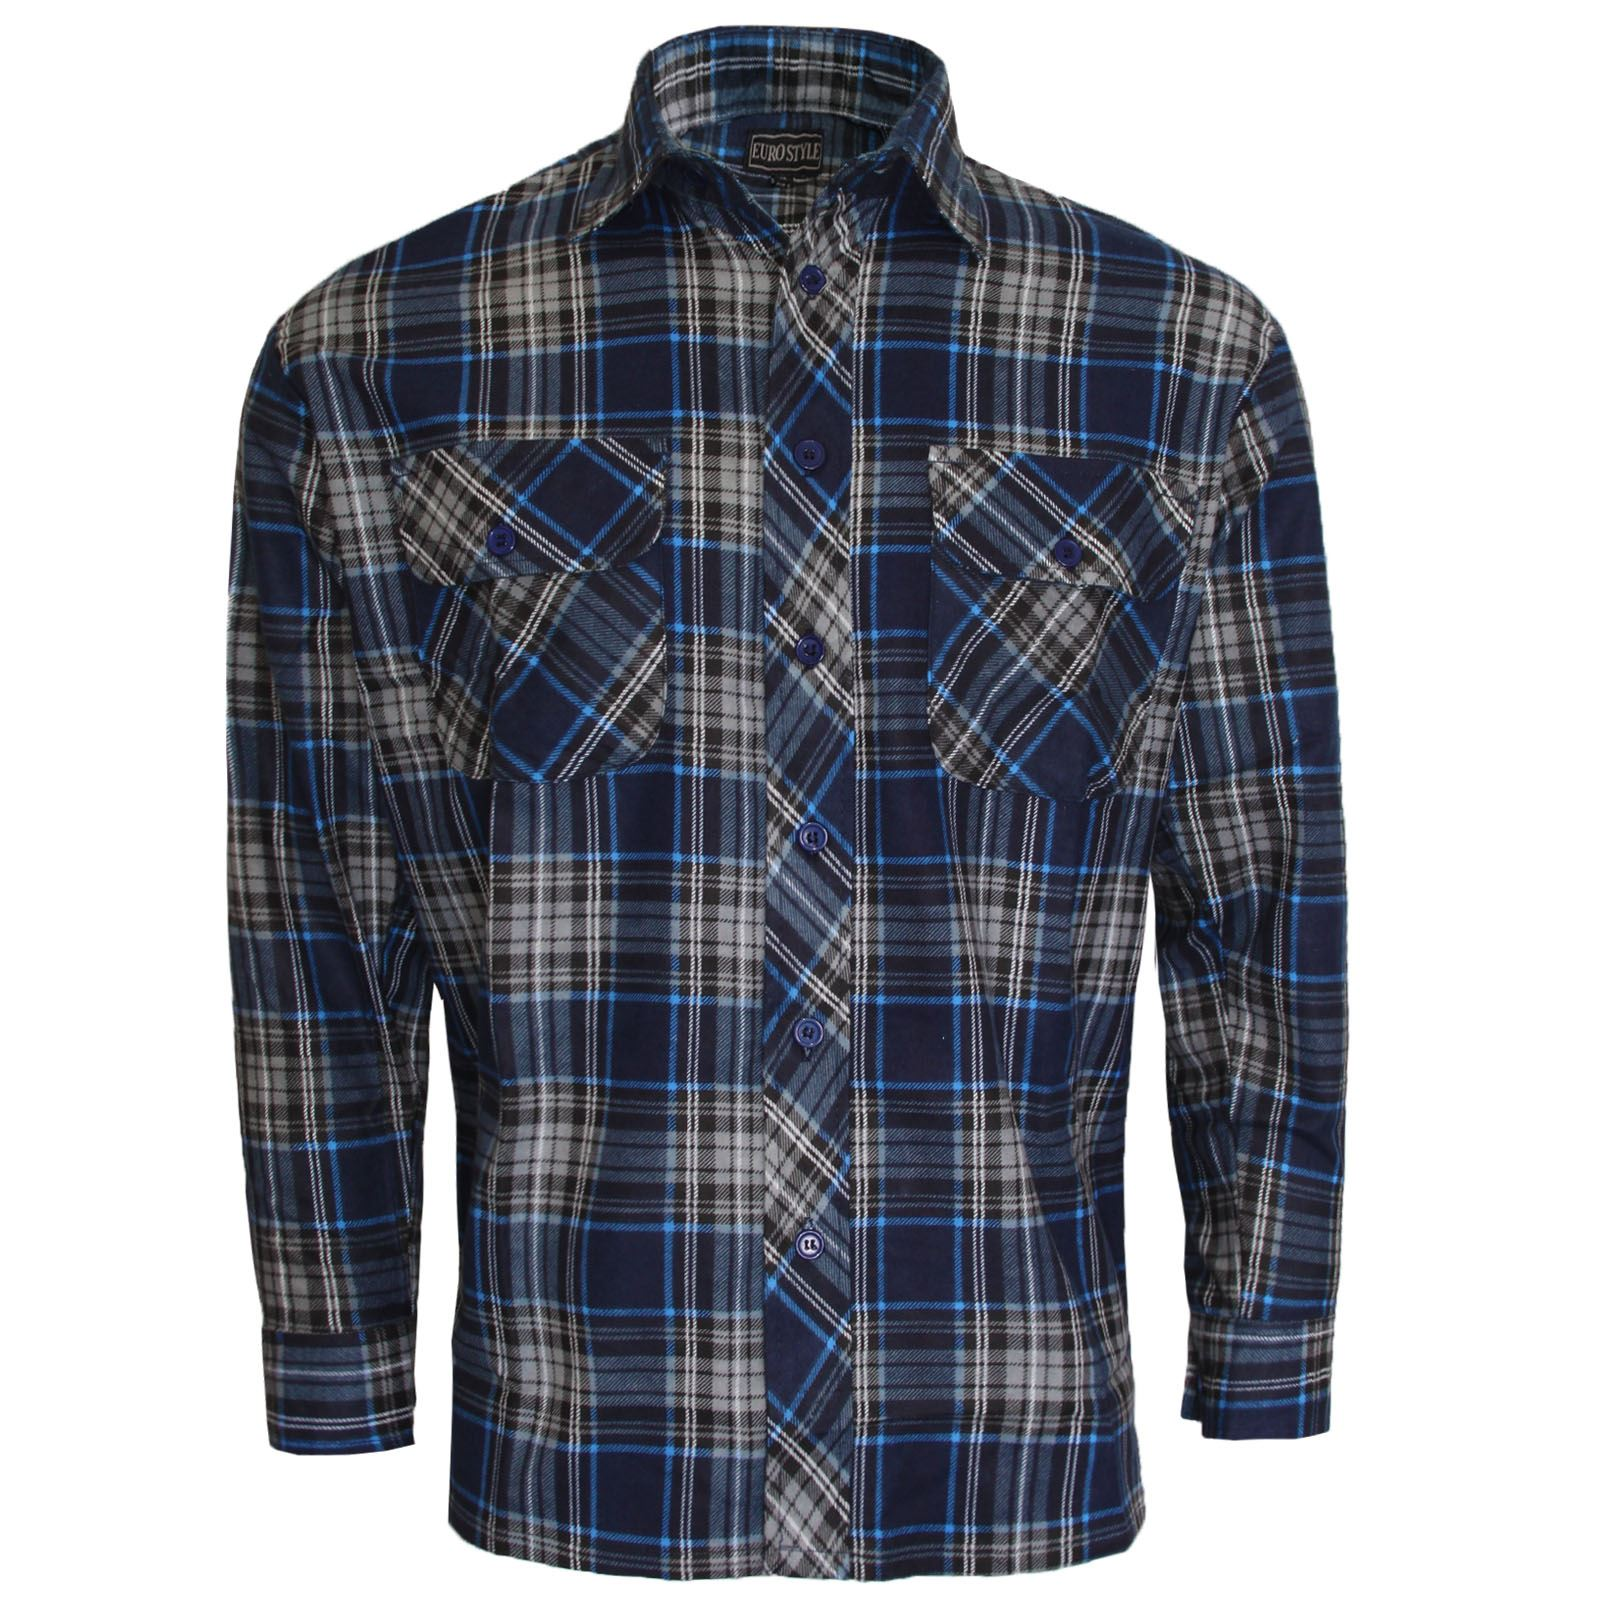 Mens flannel lumberjack check shirt cotton work shirts for Mens xl flannel shirts